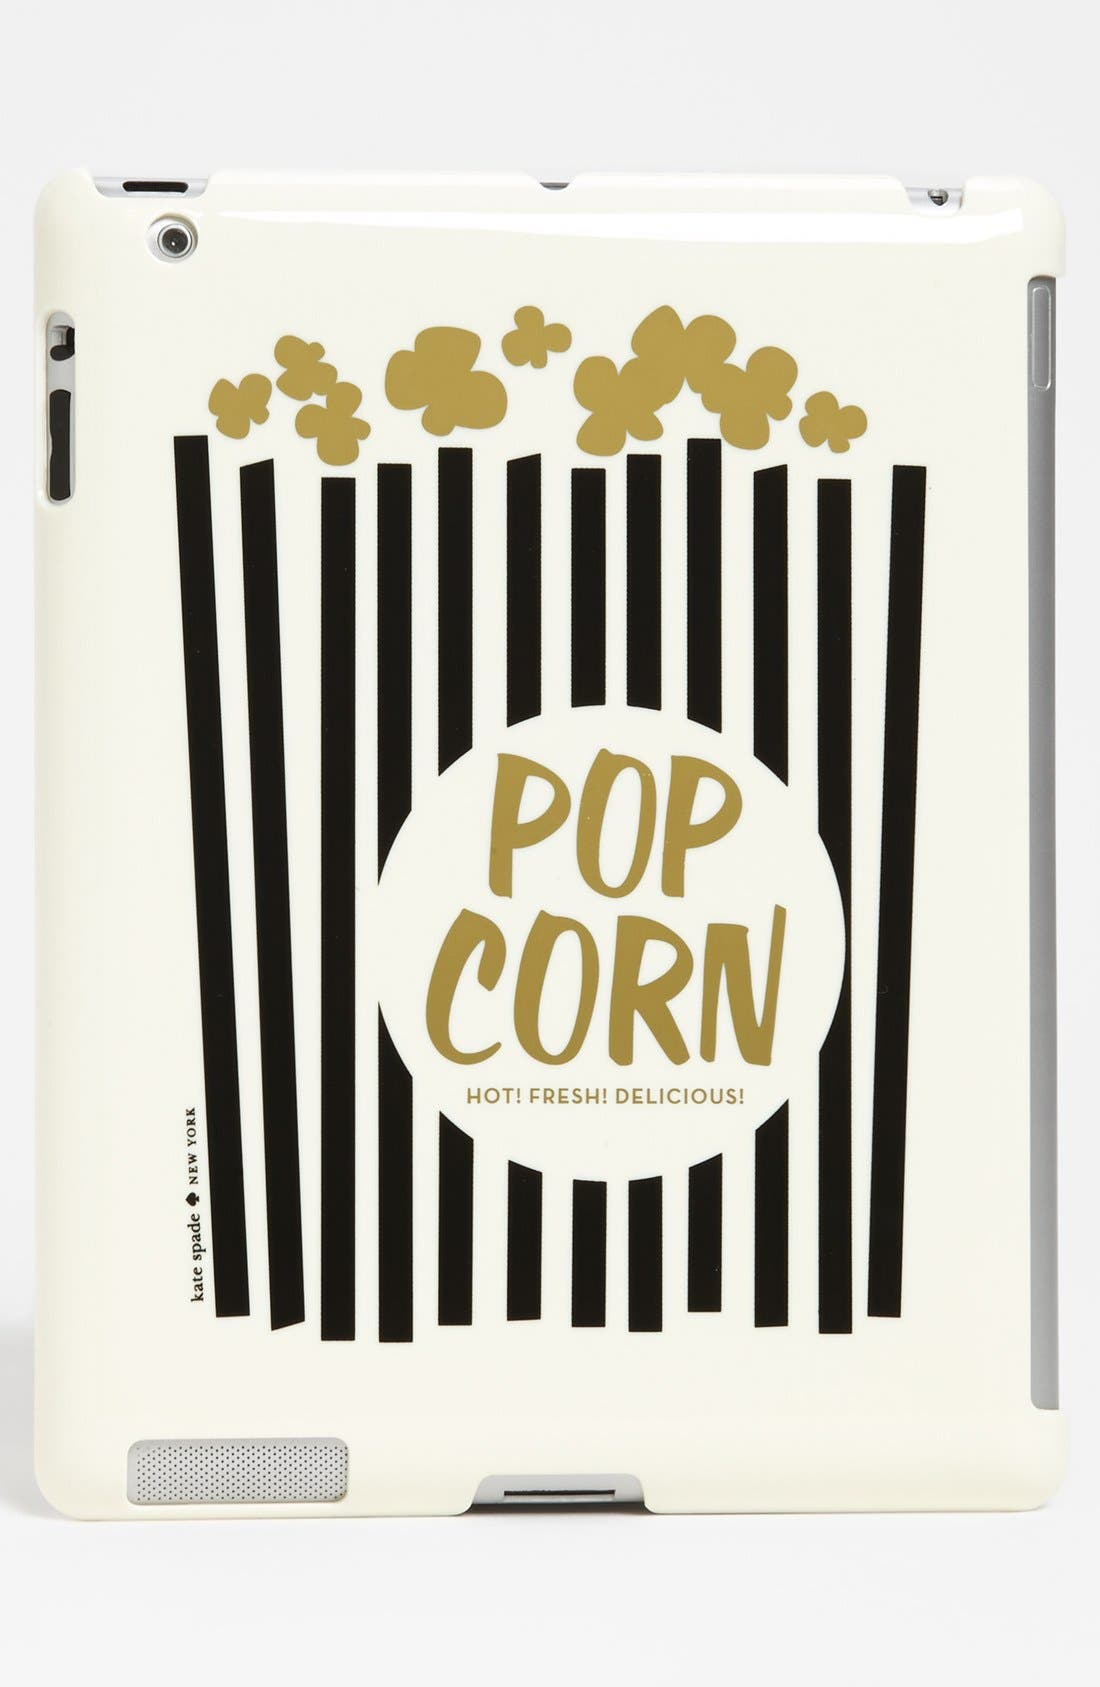 Alternate Image 1 Selected - kate spade new york 'popcorn' iPad case